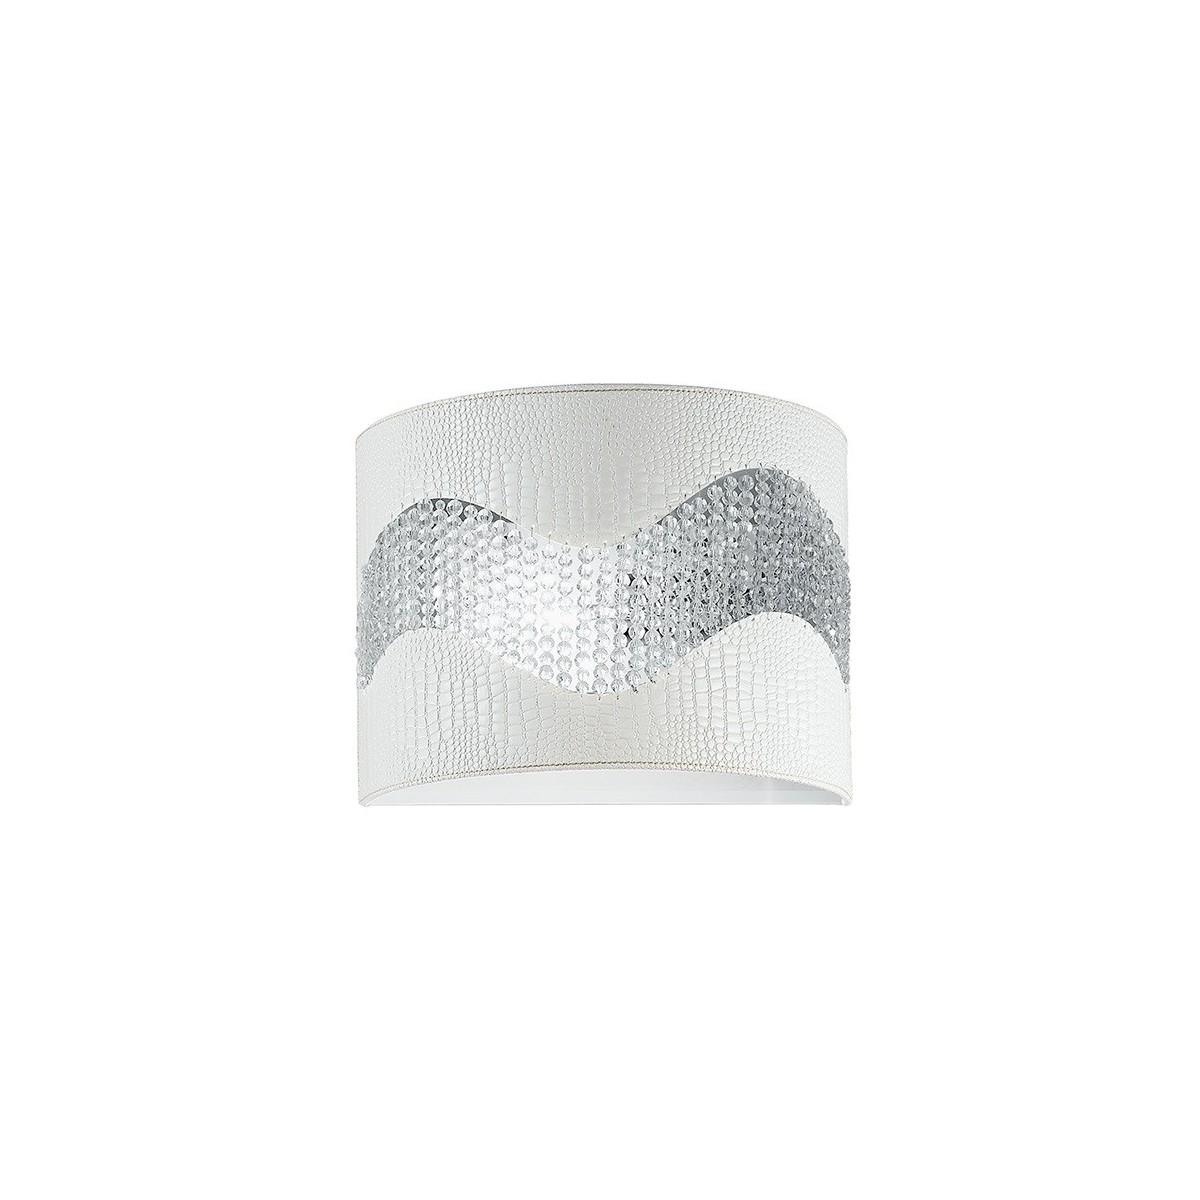 I-ECLIPSE/AP2 - Applique Ecopelle Bianca Fascia Cristalli K9 Lampada da Parete Moderna E14